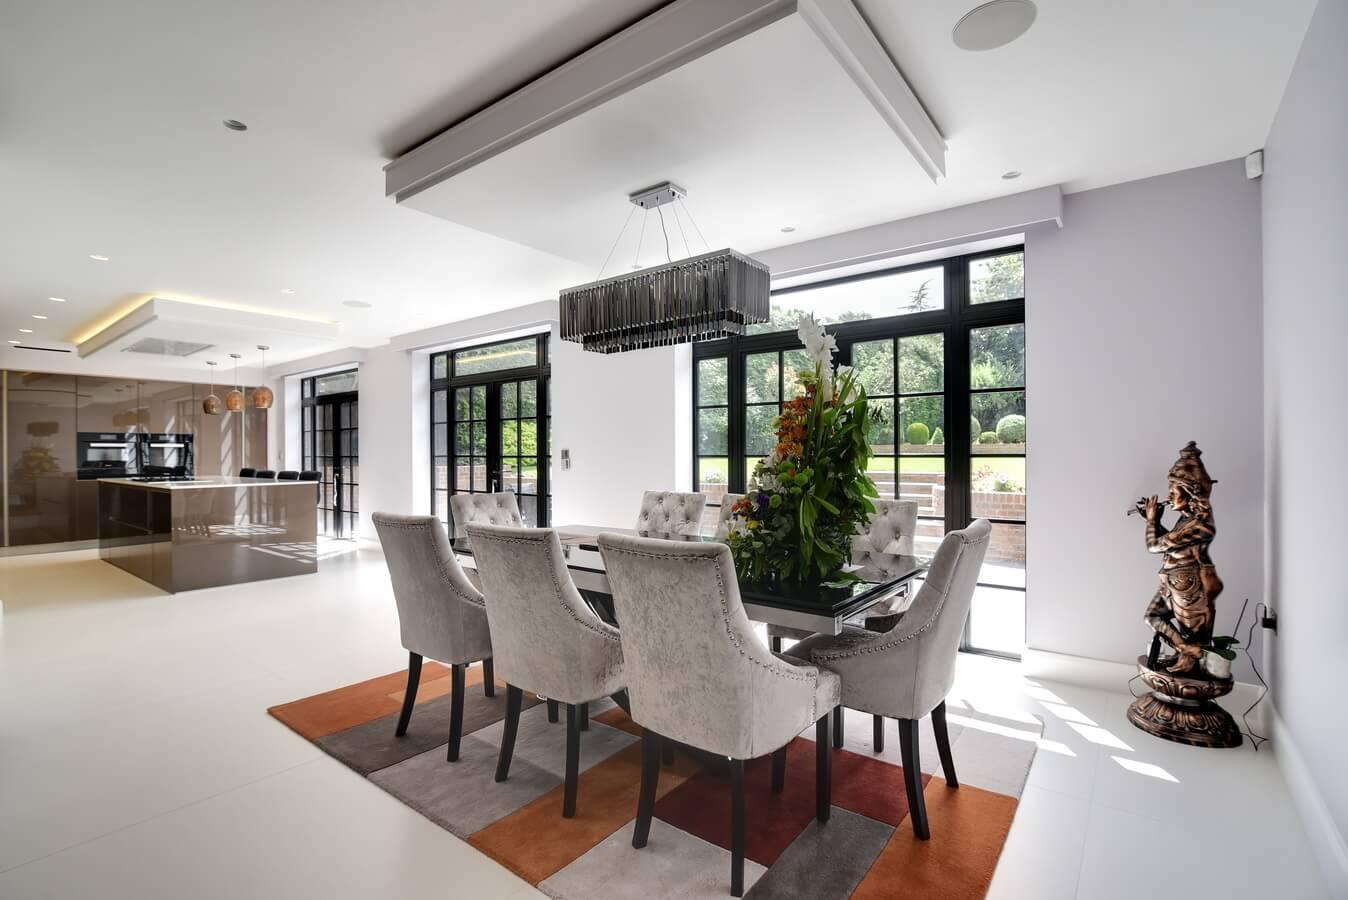 kitchen-dining-room-view-next125-london.jpg